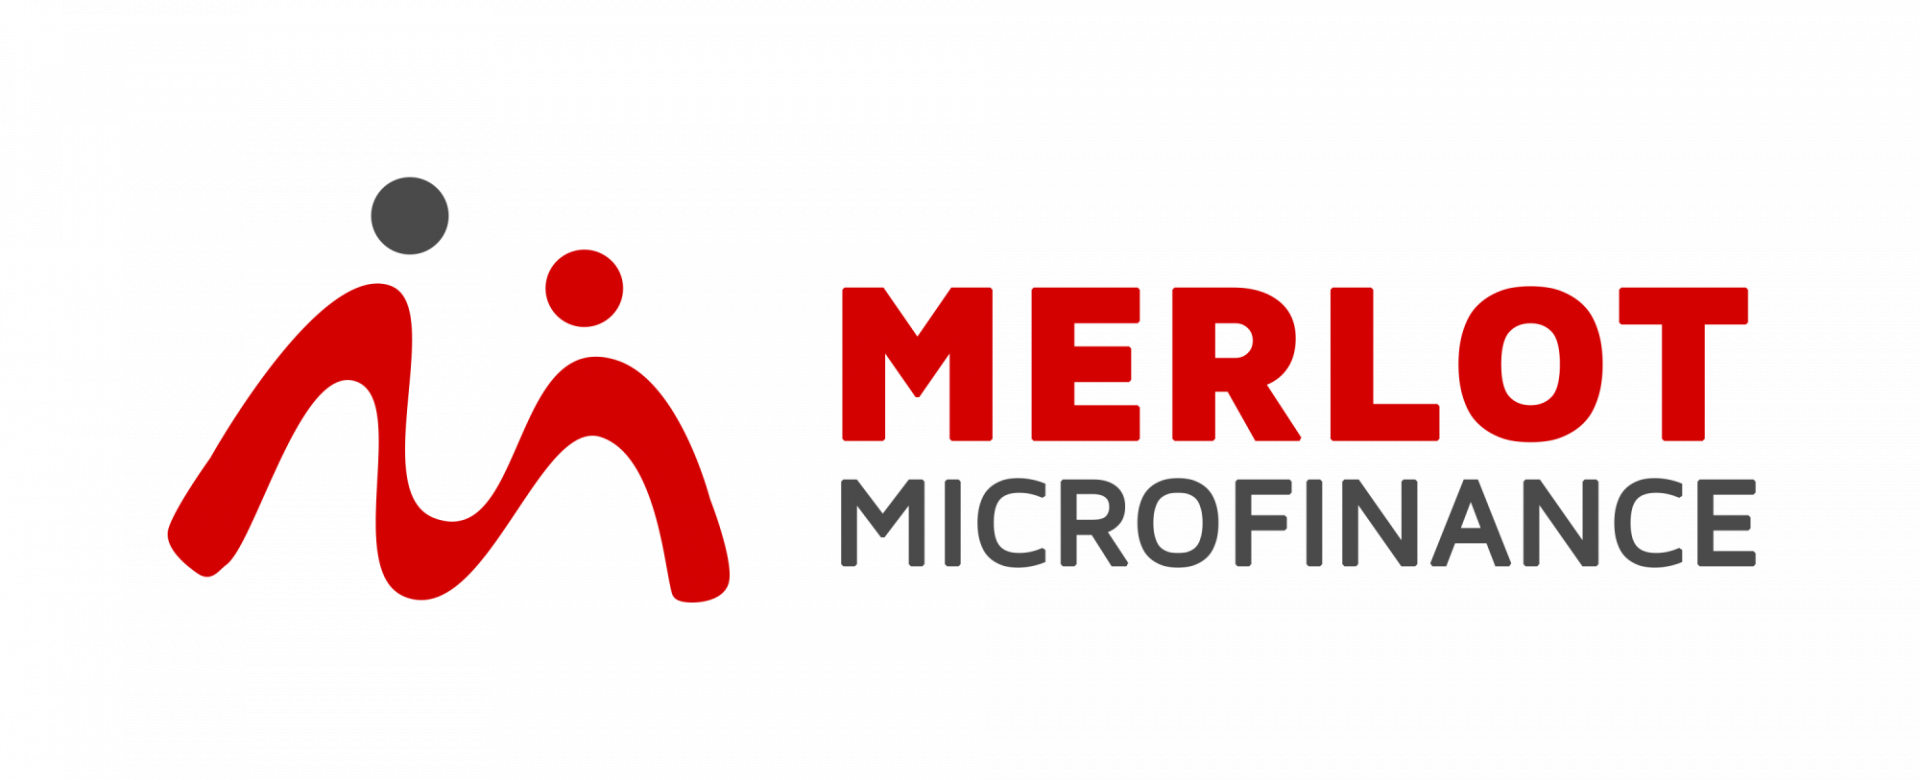 MERLOT MICROFINANCE logo 3